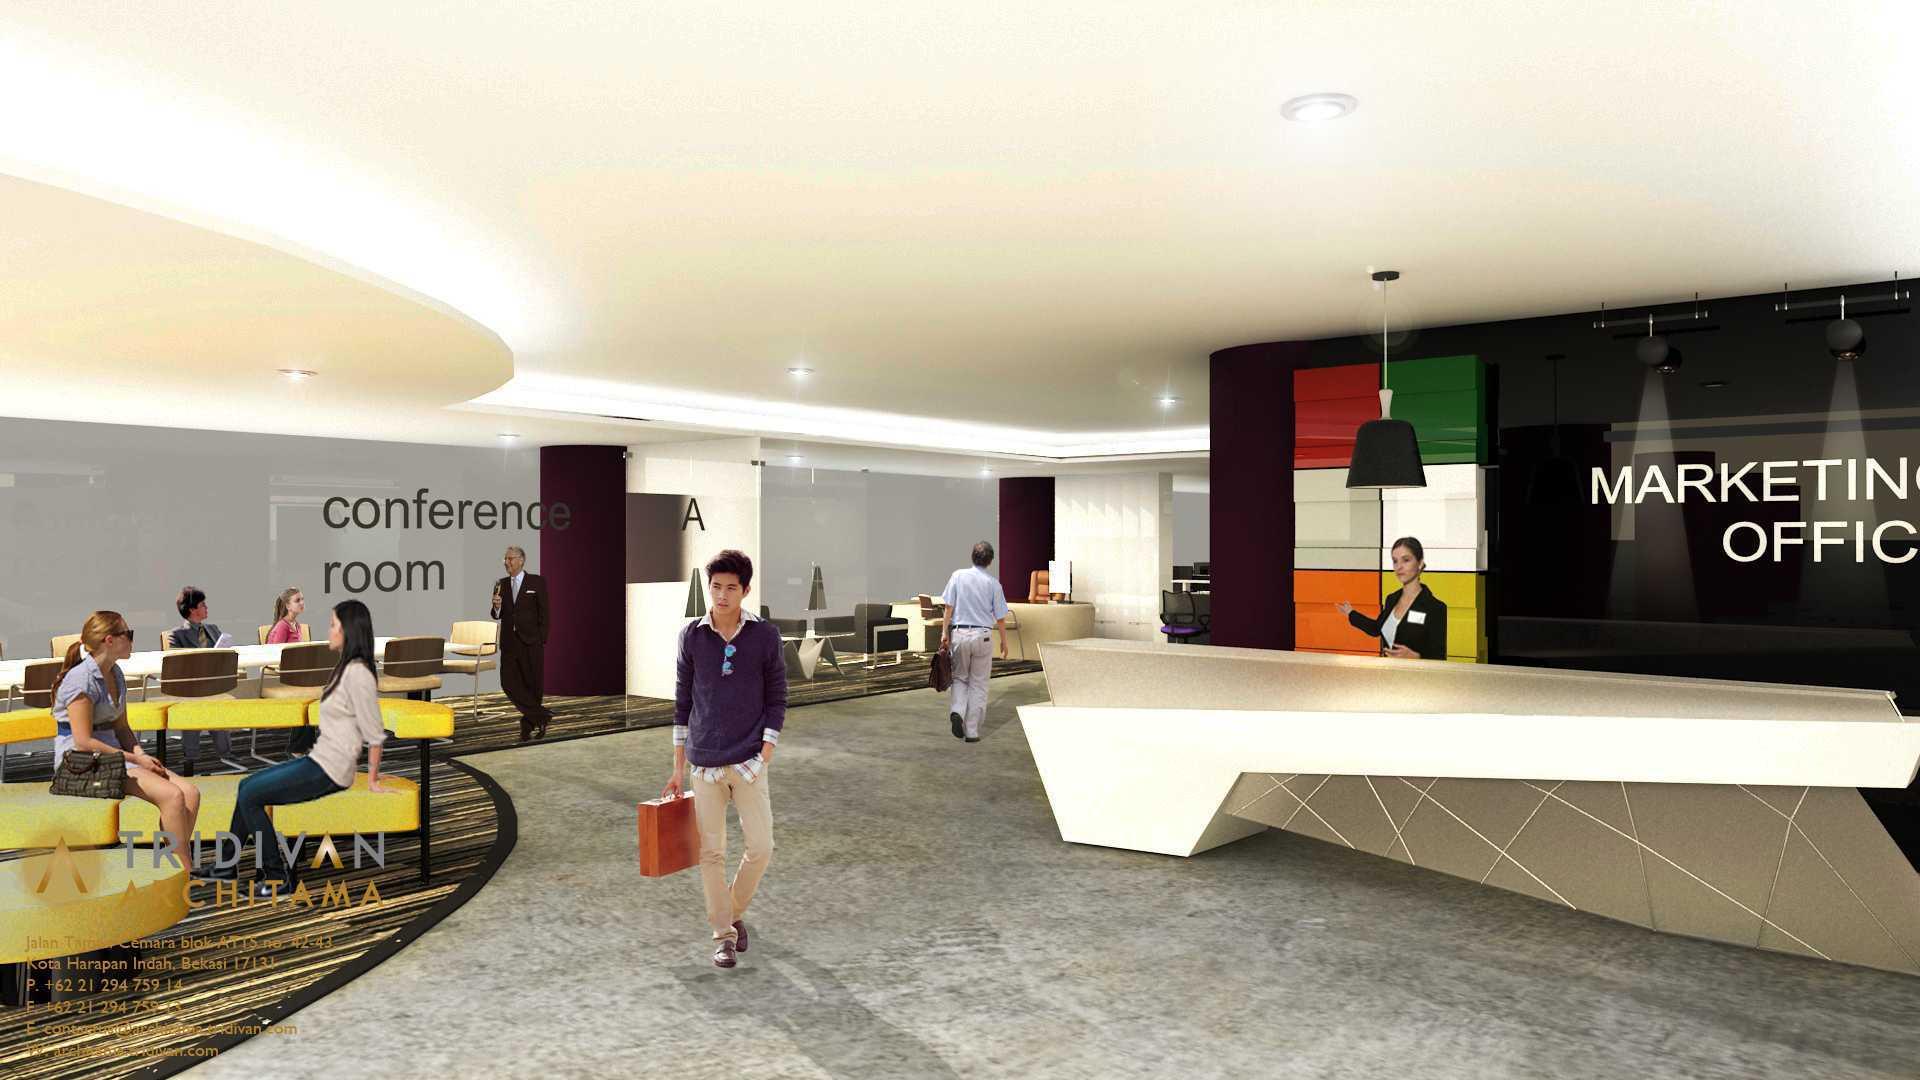 Tridivan Architama S's Office Central Java, Indonesia Central Java, Indonesia 2Nd Floor Modern  20698